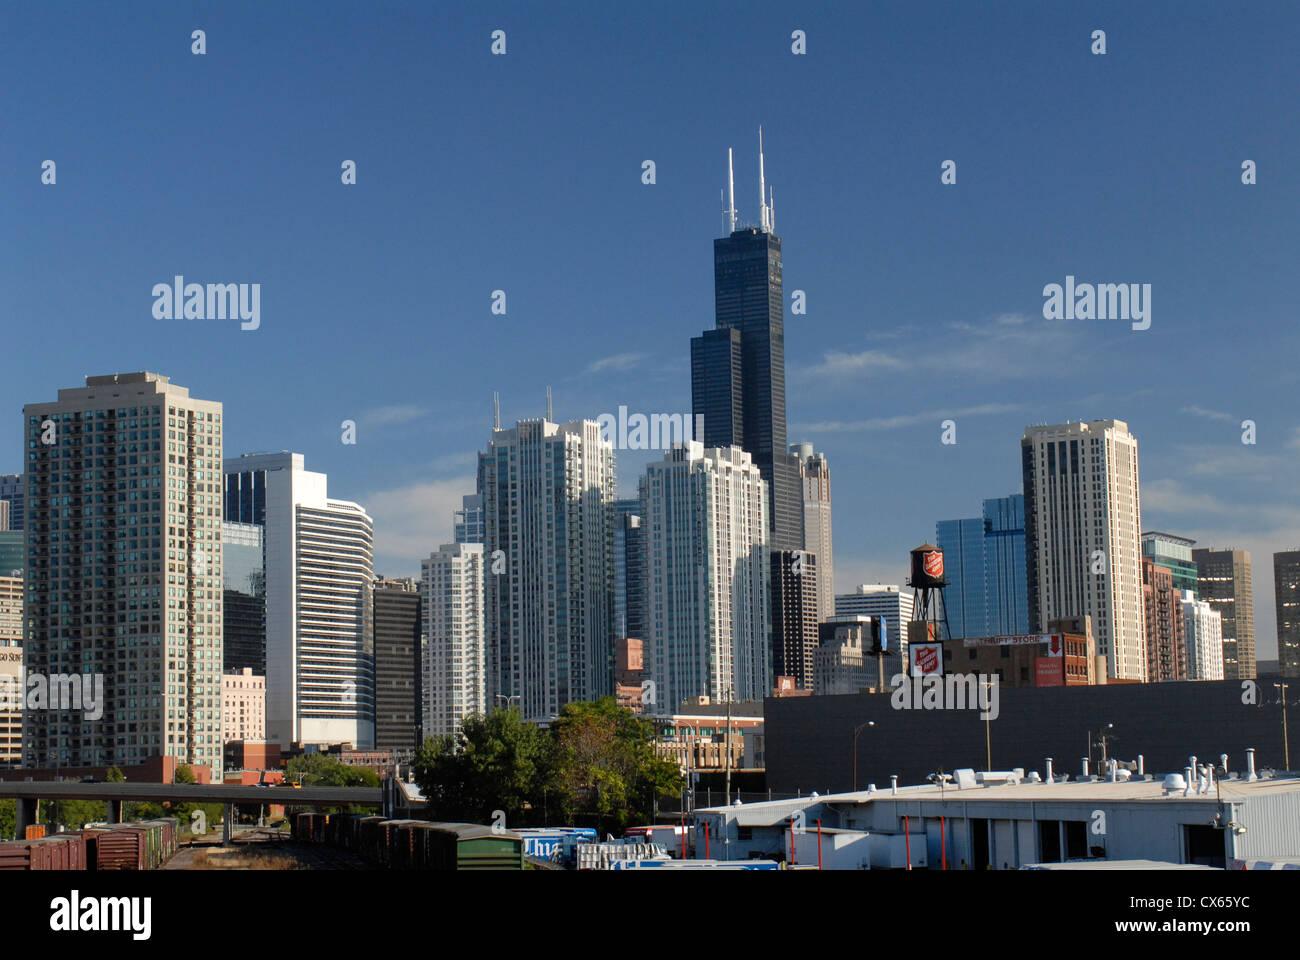 Chicago High Rises Imágenes De Stock & Chicago High Rises Fotos De ...